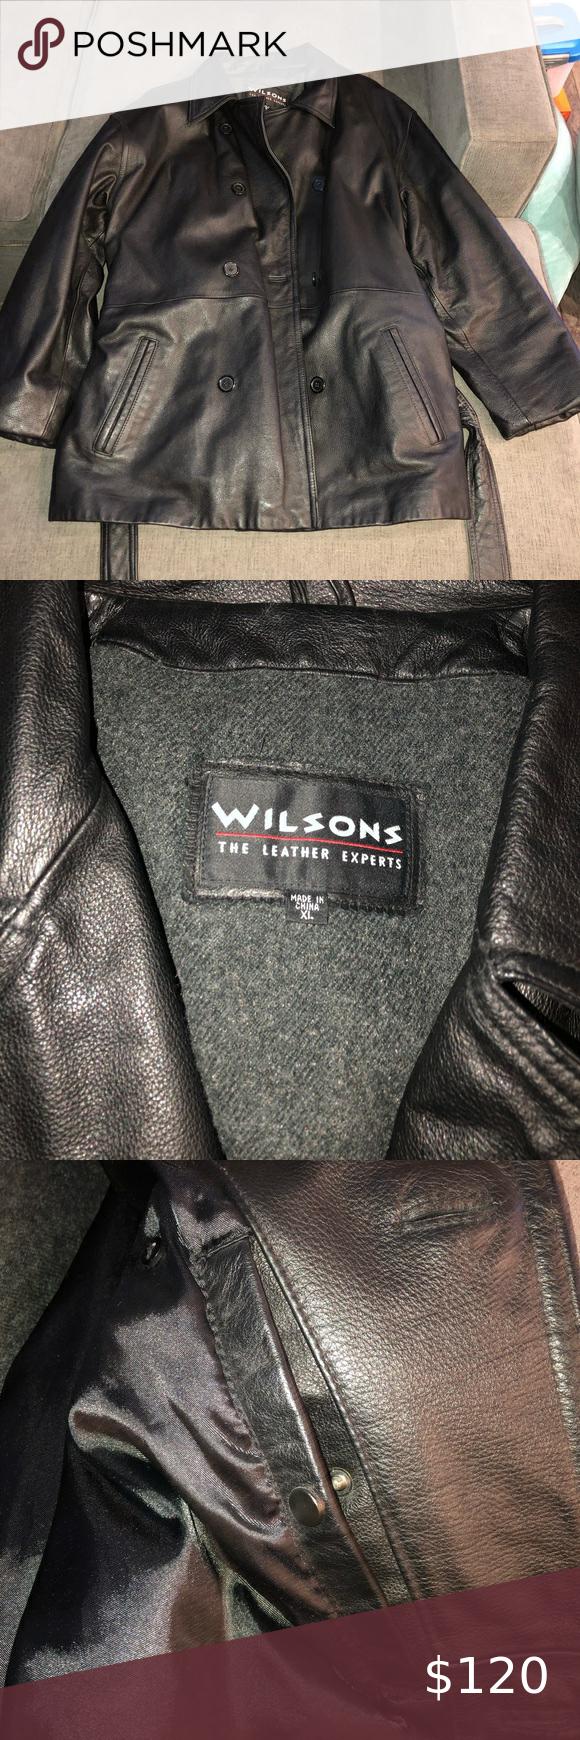 Men S Wilson Leather Jacket Wilsons Leather Jacket Wilsons Leather Vintage Leather Jacket [ 1740 x 580 Pixel ]